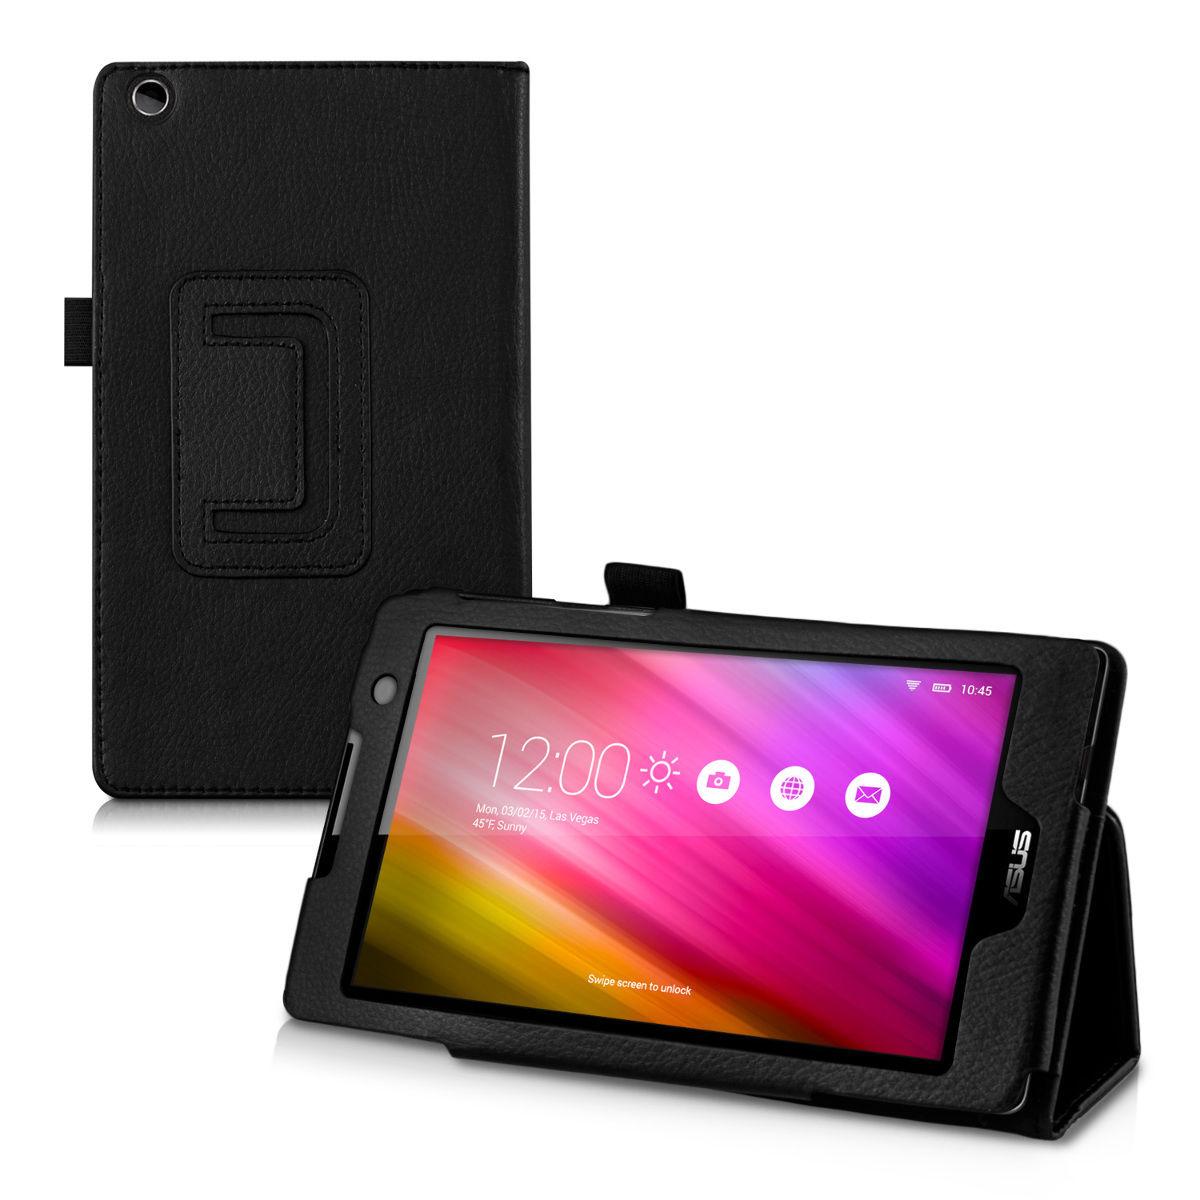 Pouzdro pro ASUS ZenPad C Z170C/Z170CG černé